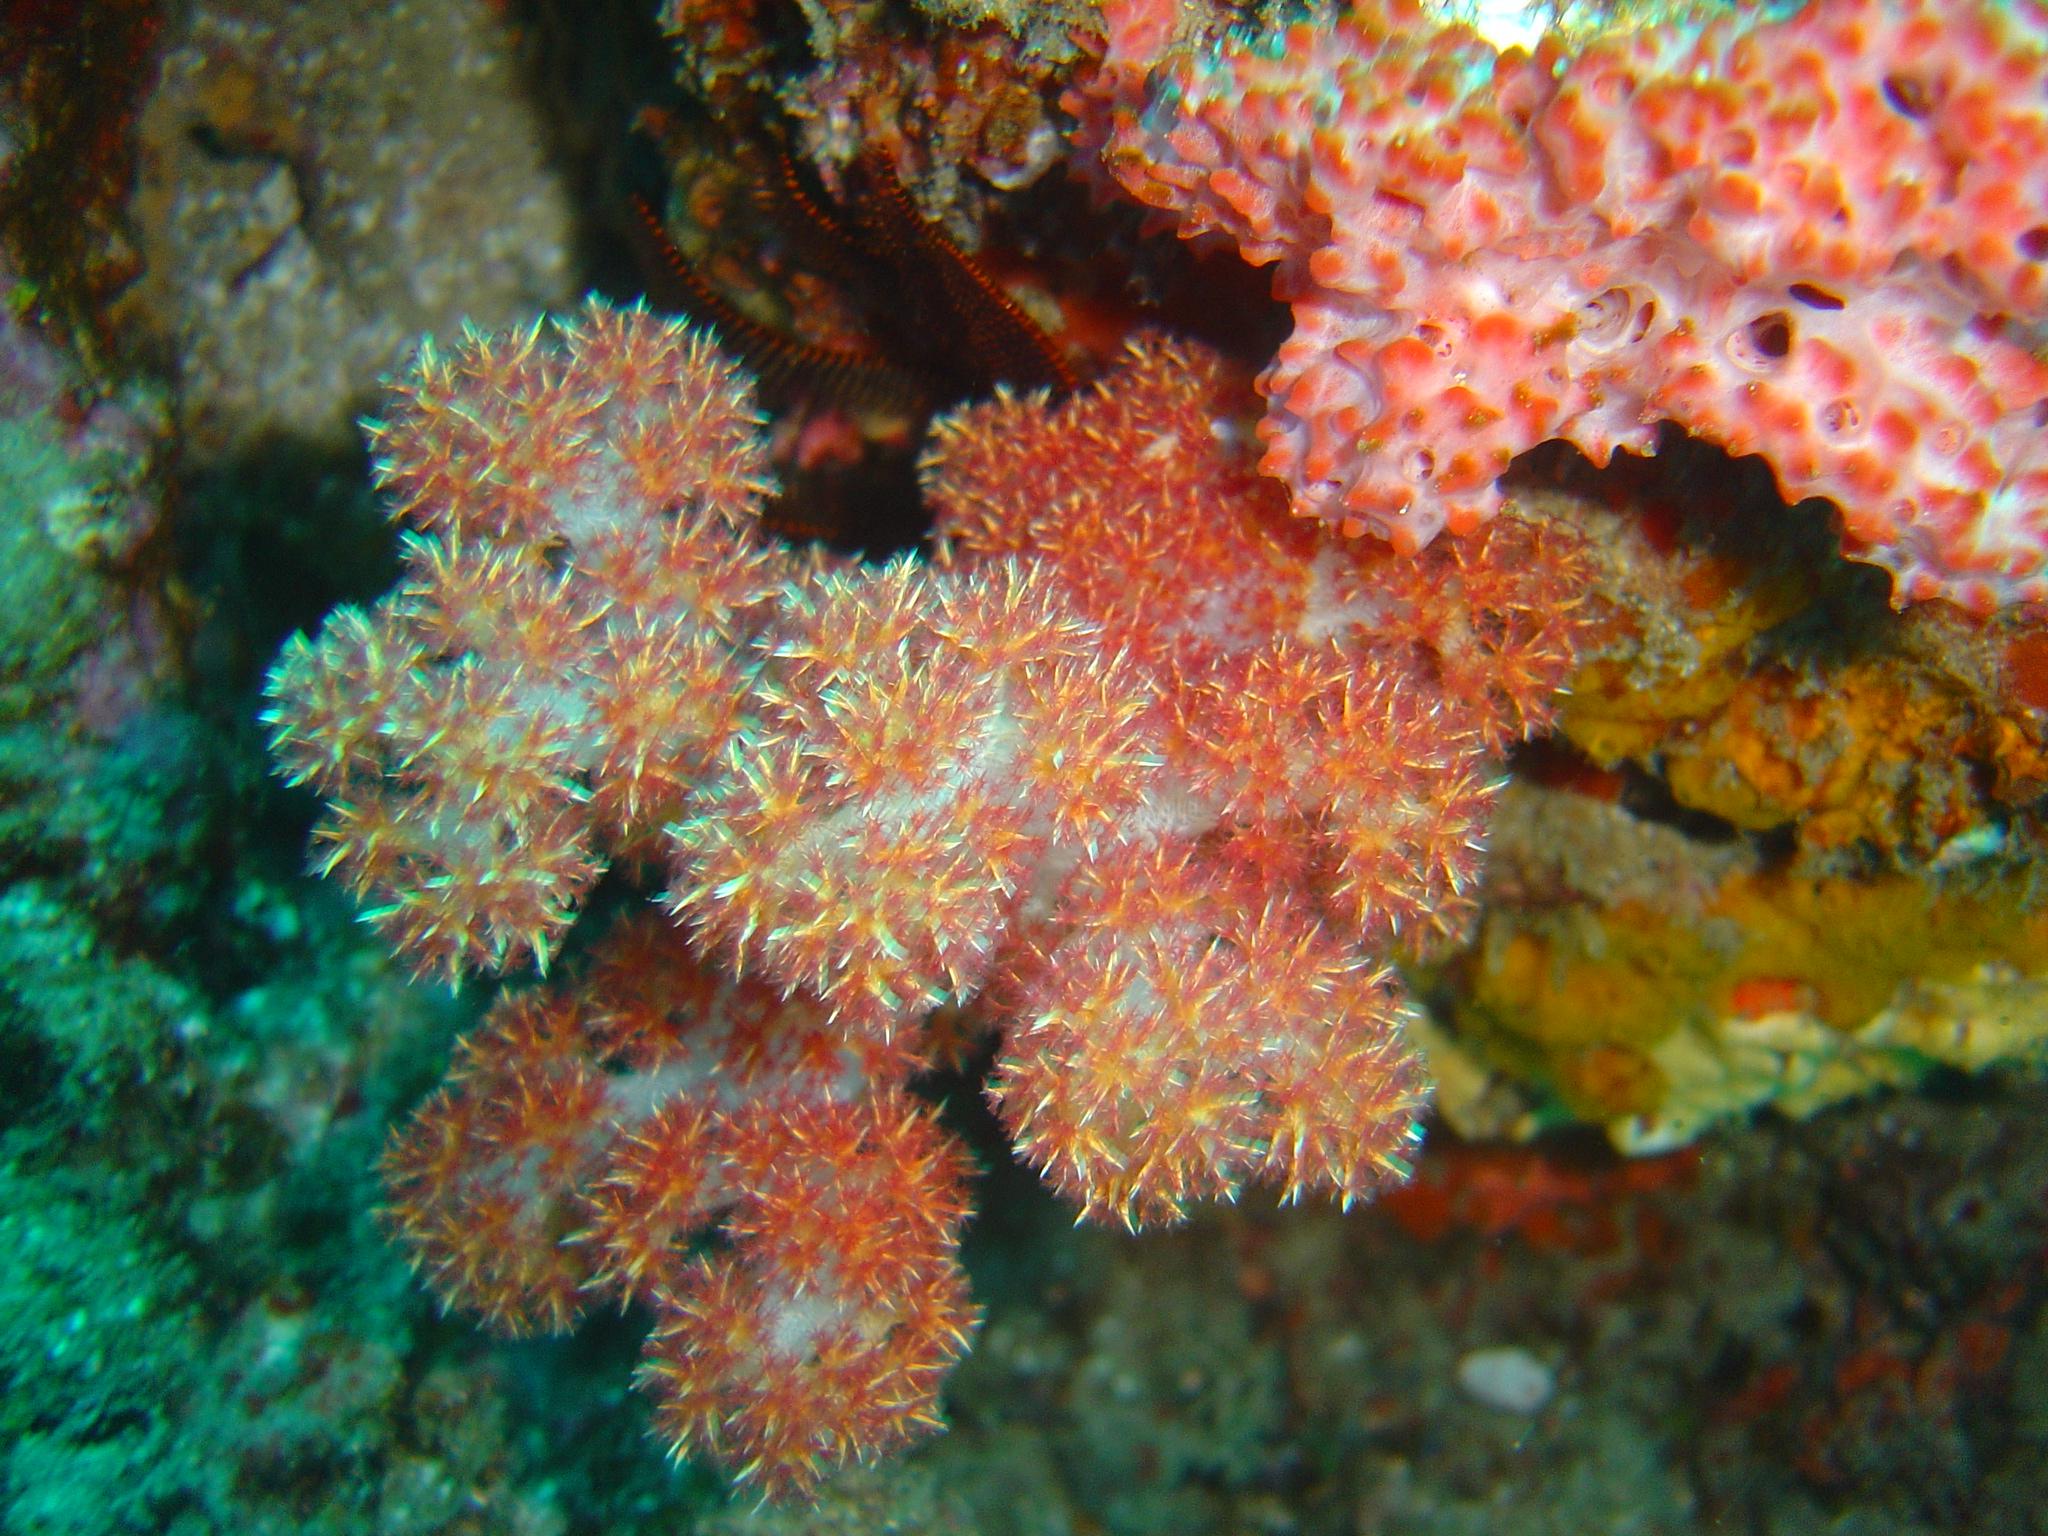 Description Thistle soft coral at Batfish pinnacle dsc04309.jpg